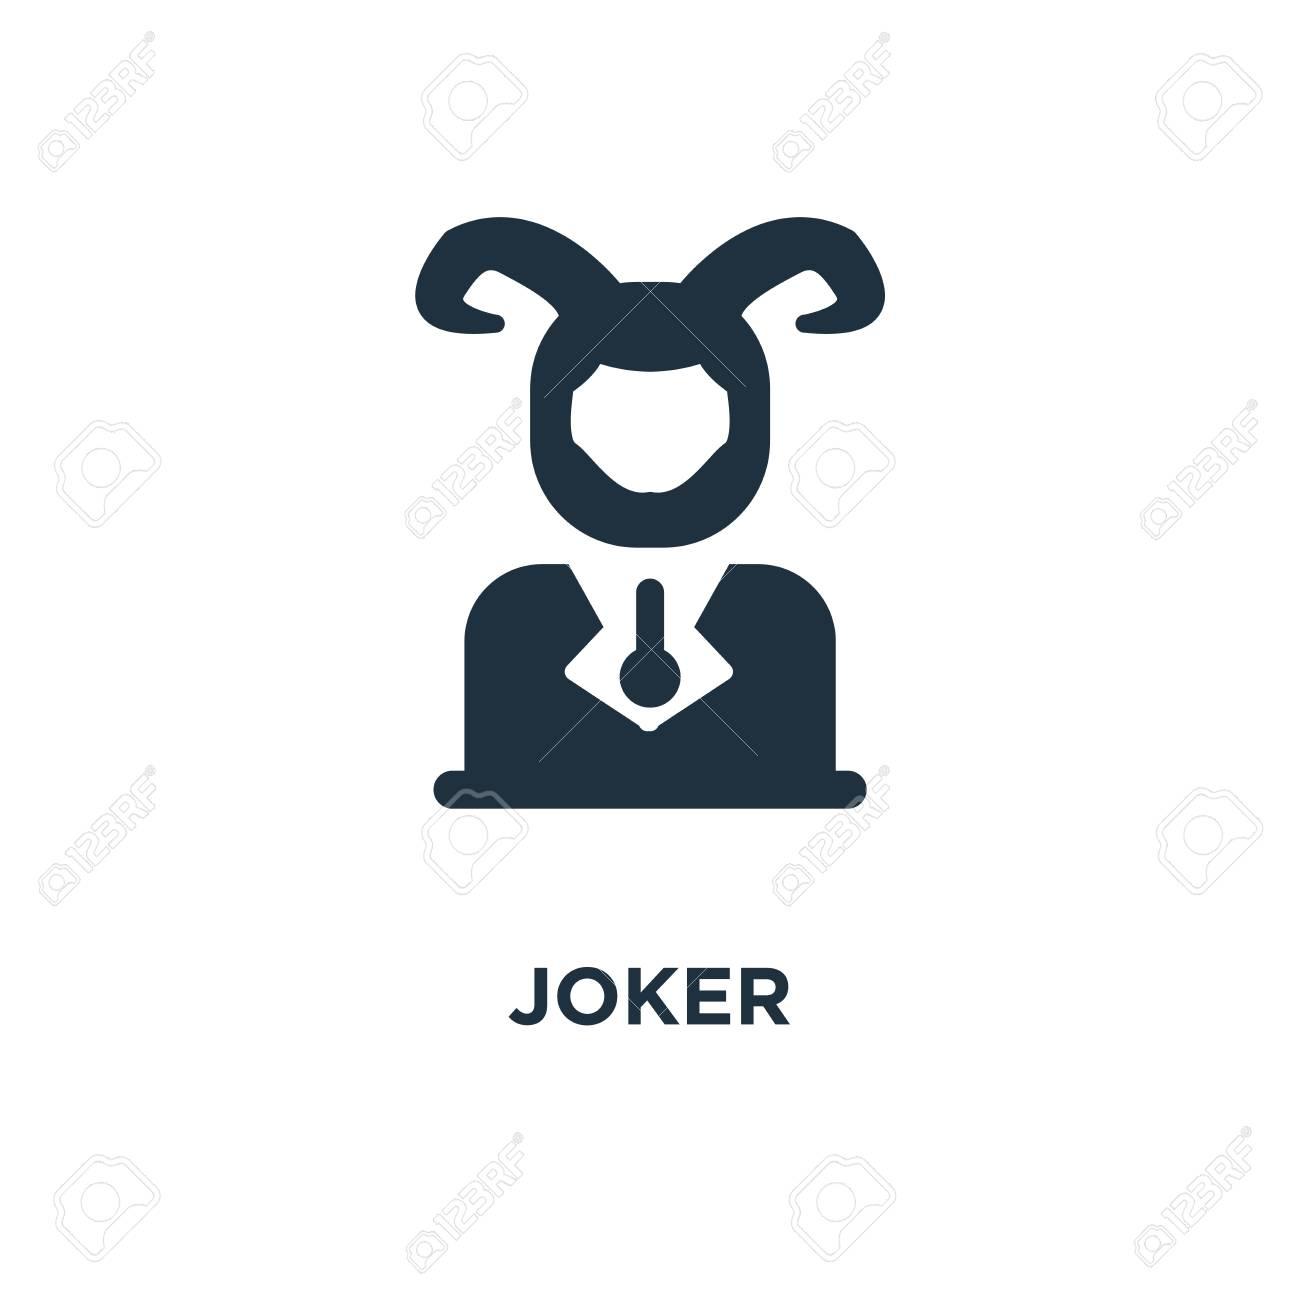 Joker icon  Black filled vector illustration  Joker symbol on